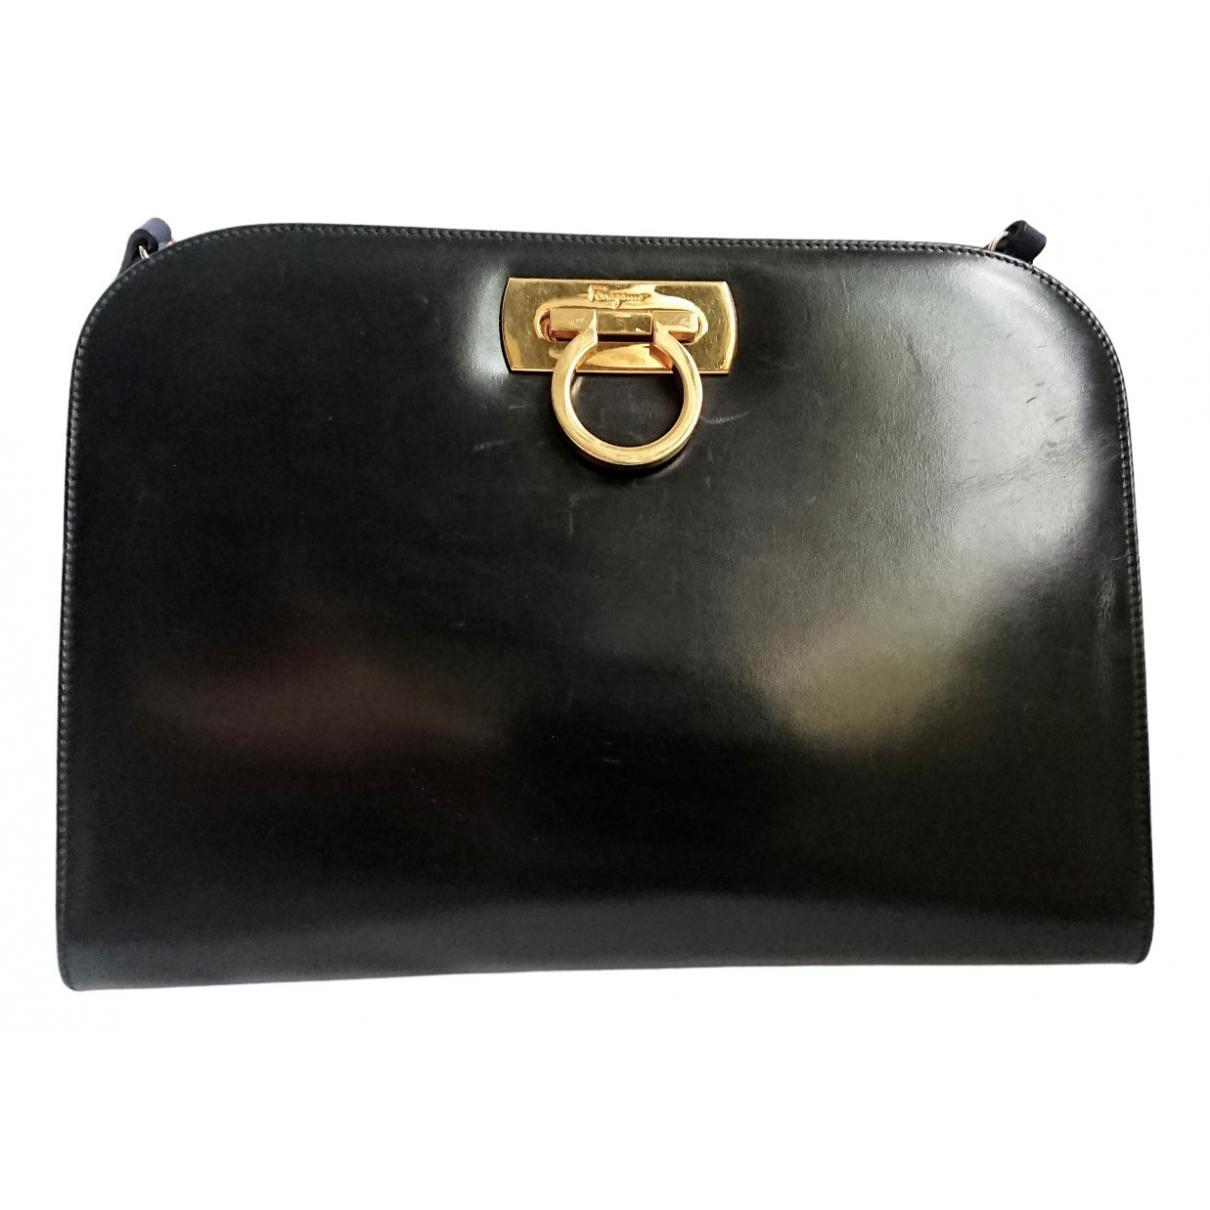 Salvatore Ferragamo \N Navy Leather handbag for Women \N